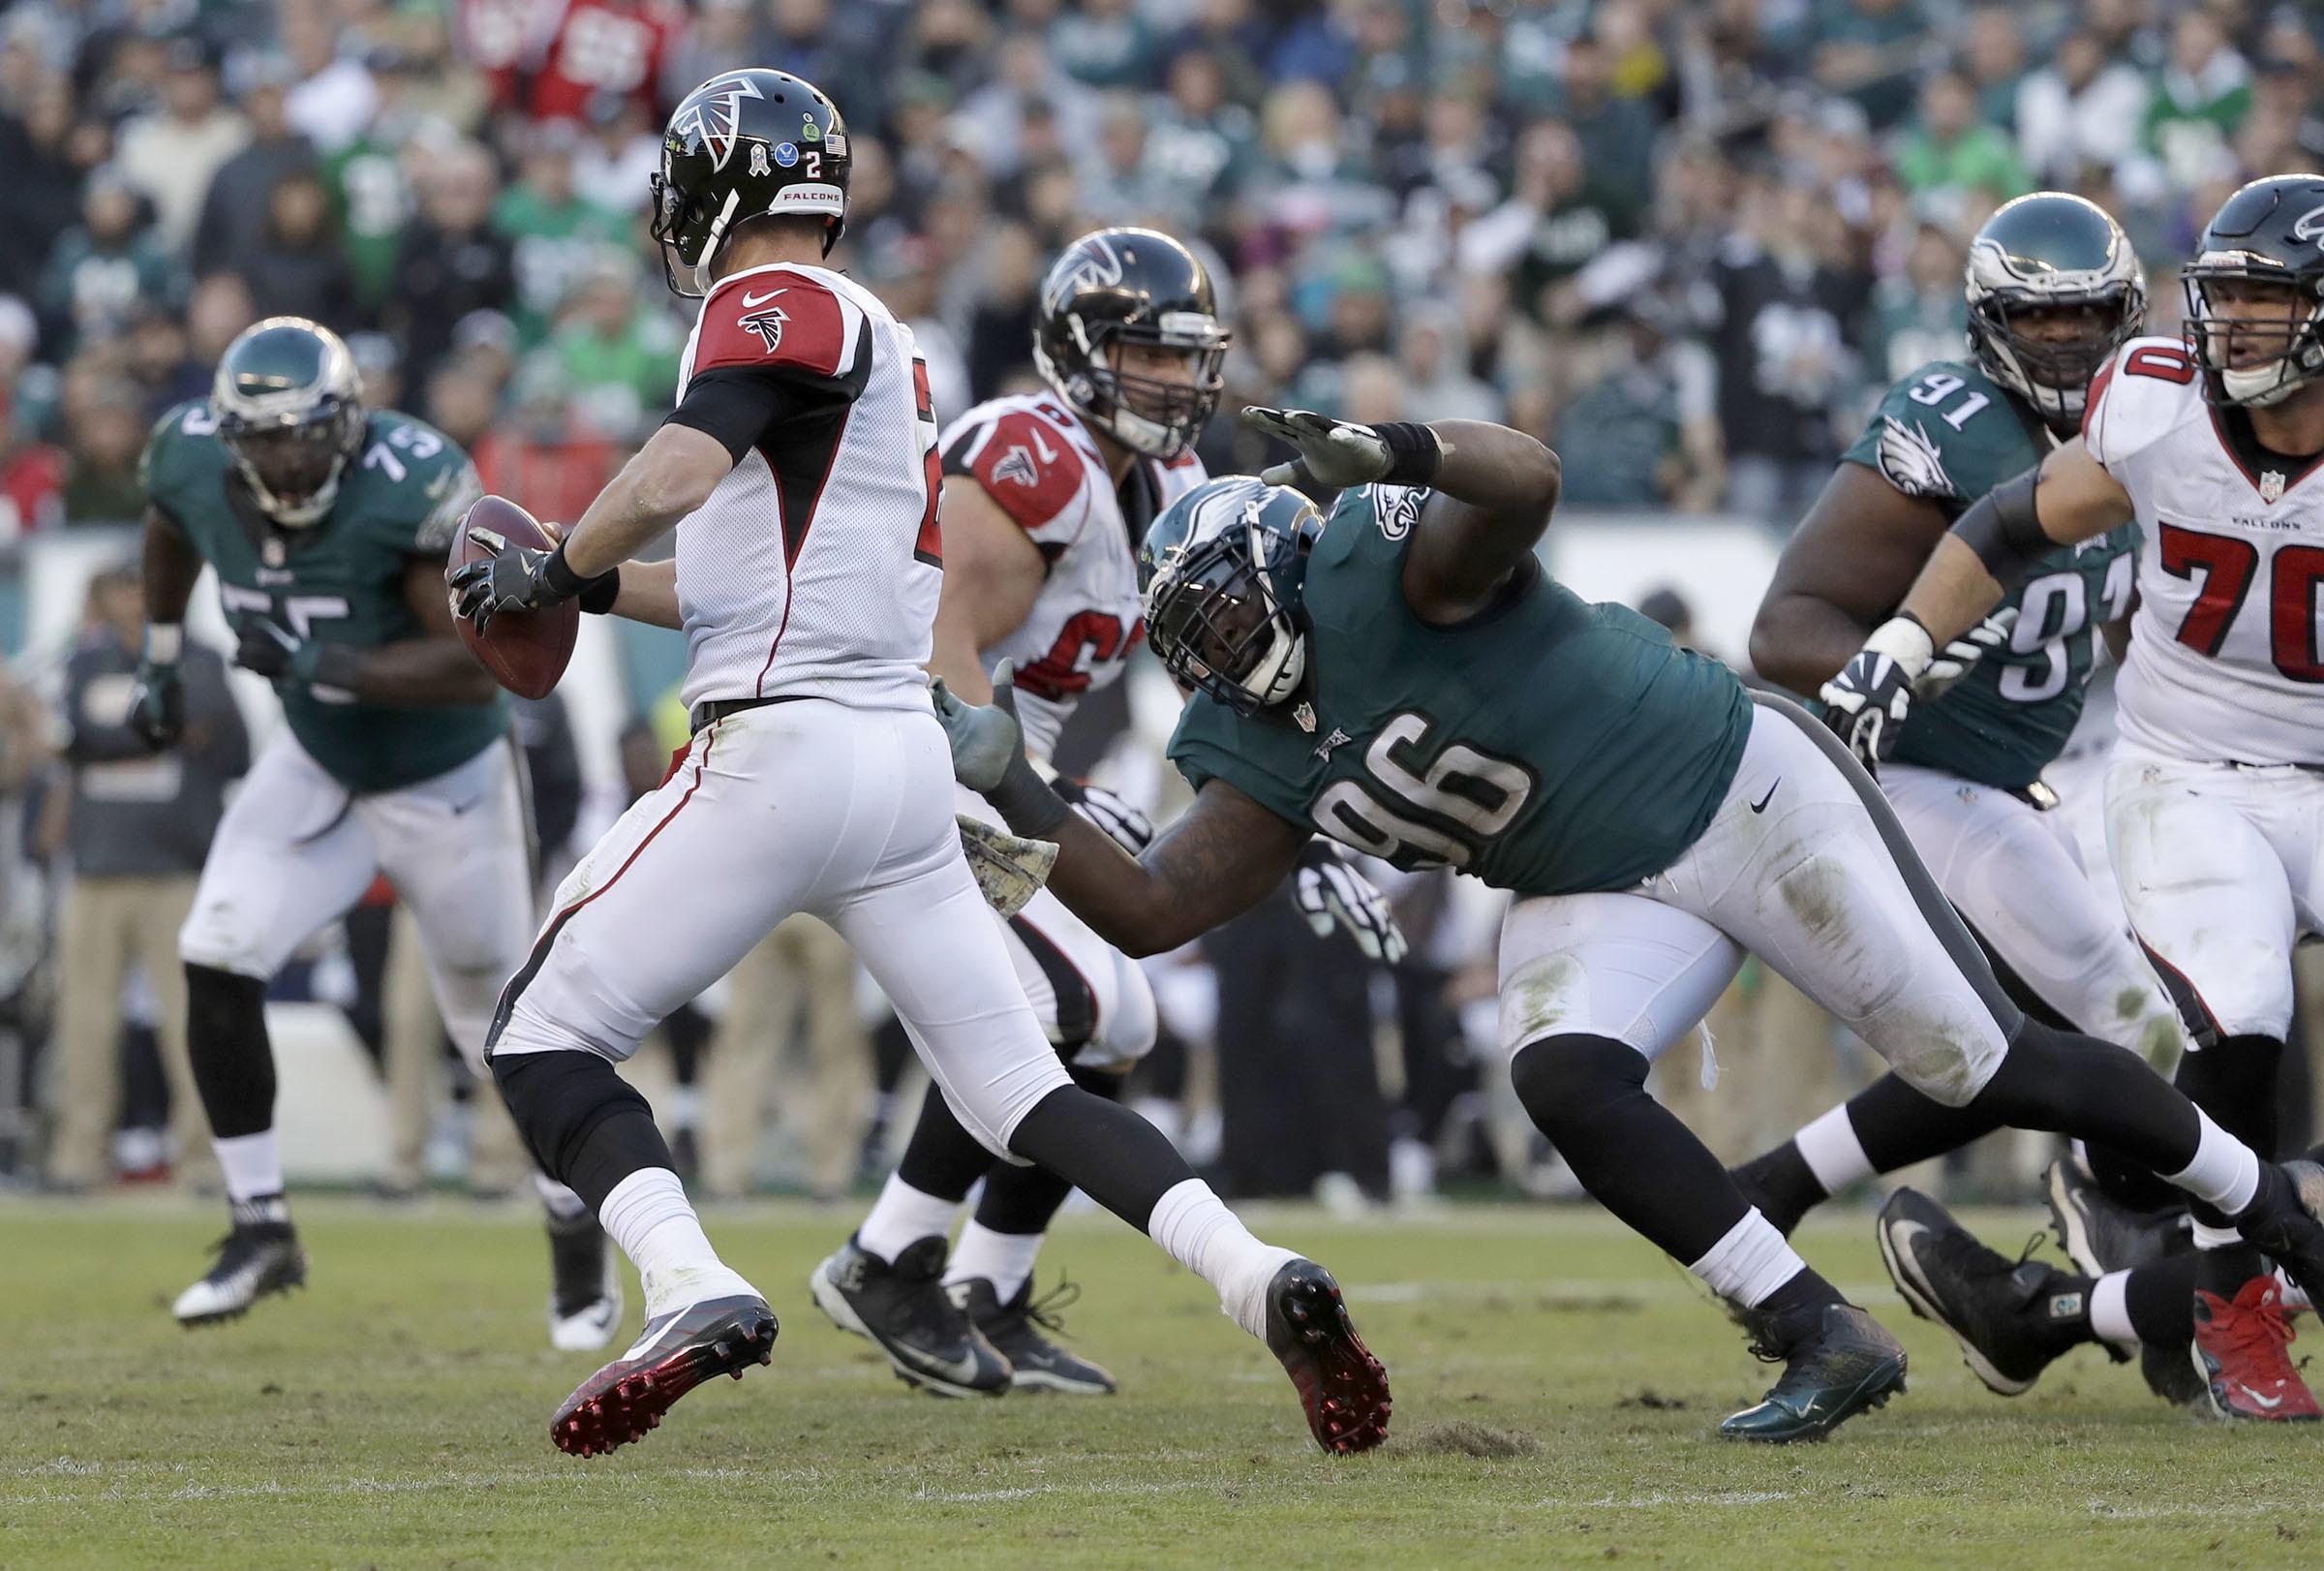 Eagles´ defensive tackle Bennie Logan goes after Atlanta Falcons´ quarterback Matt Ryan on Sunday, November 13, 2016 in Philadelphia. YONG KIM / Staff Photographer